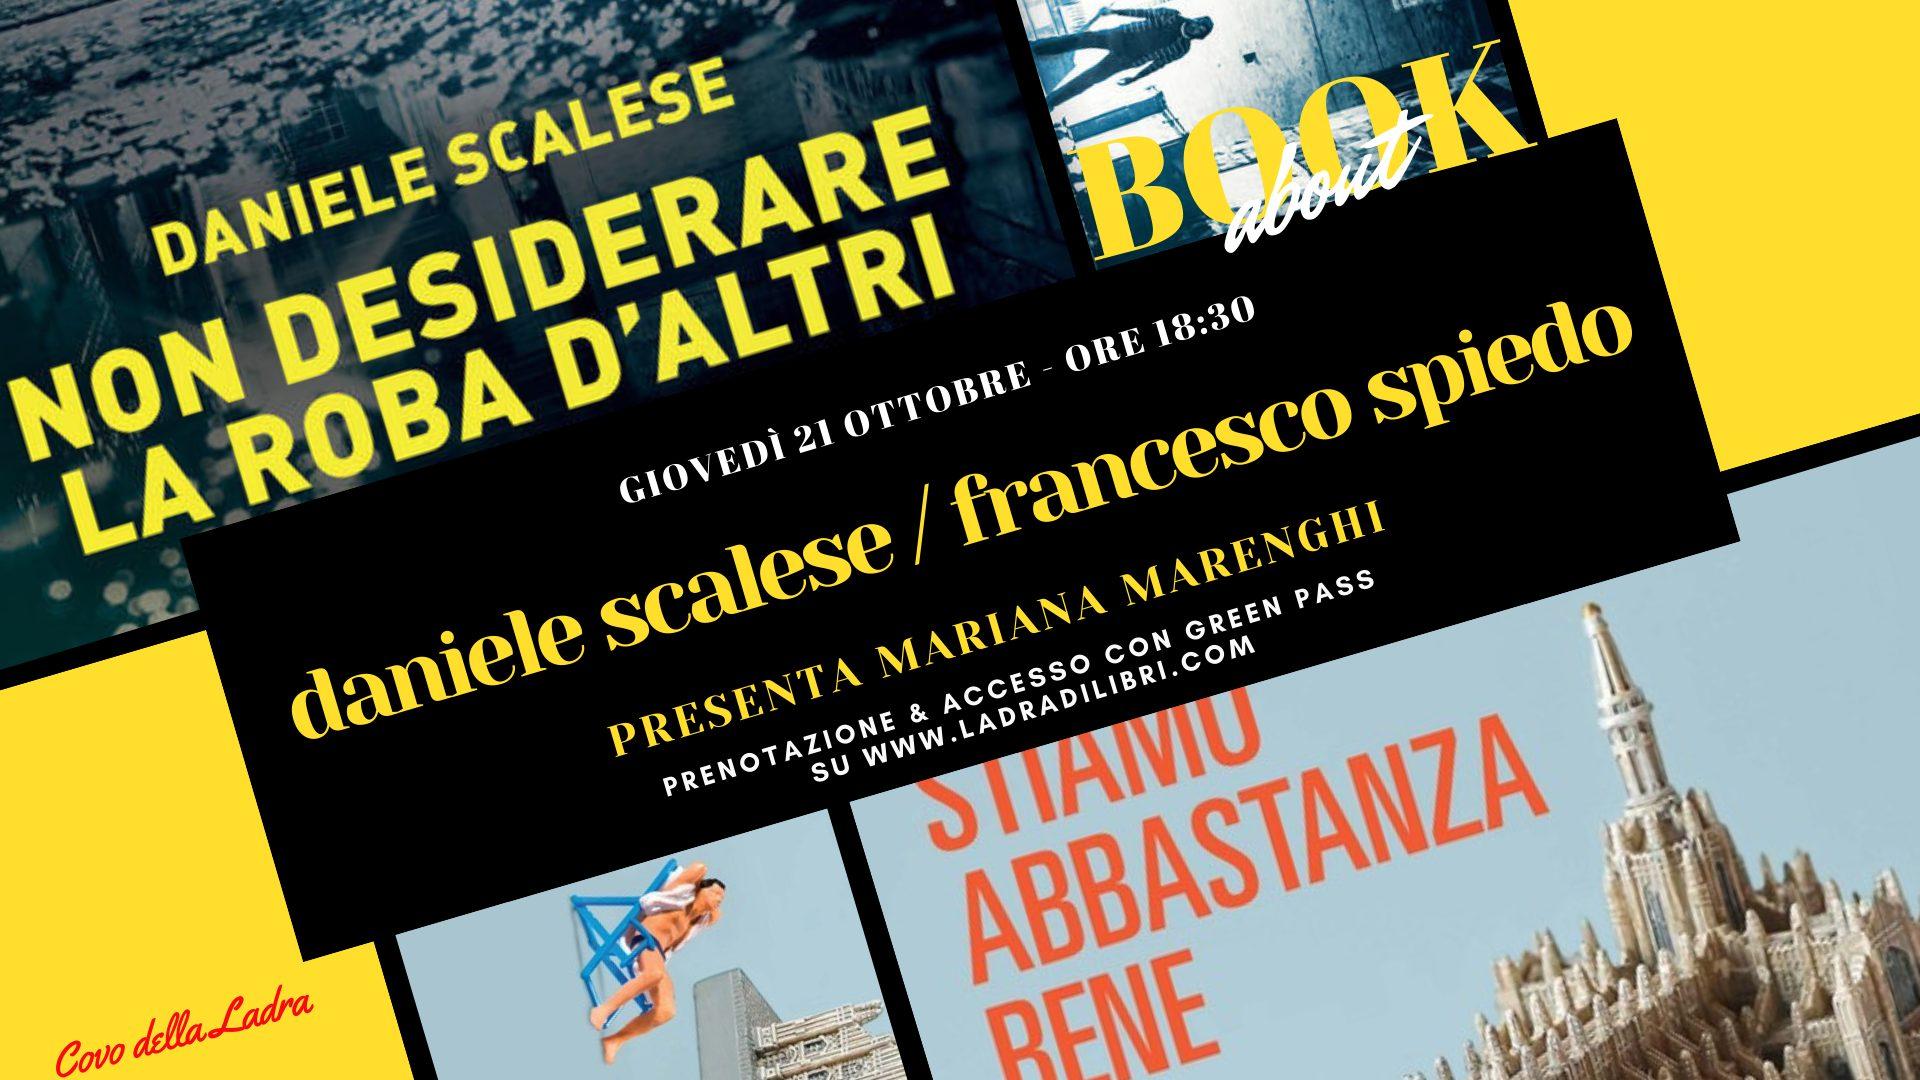 BookAbout con Daniele Scalese e Francesco Spiedo